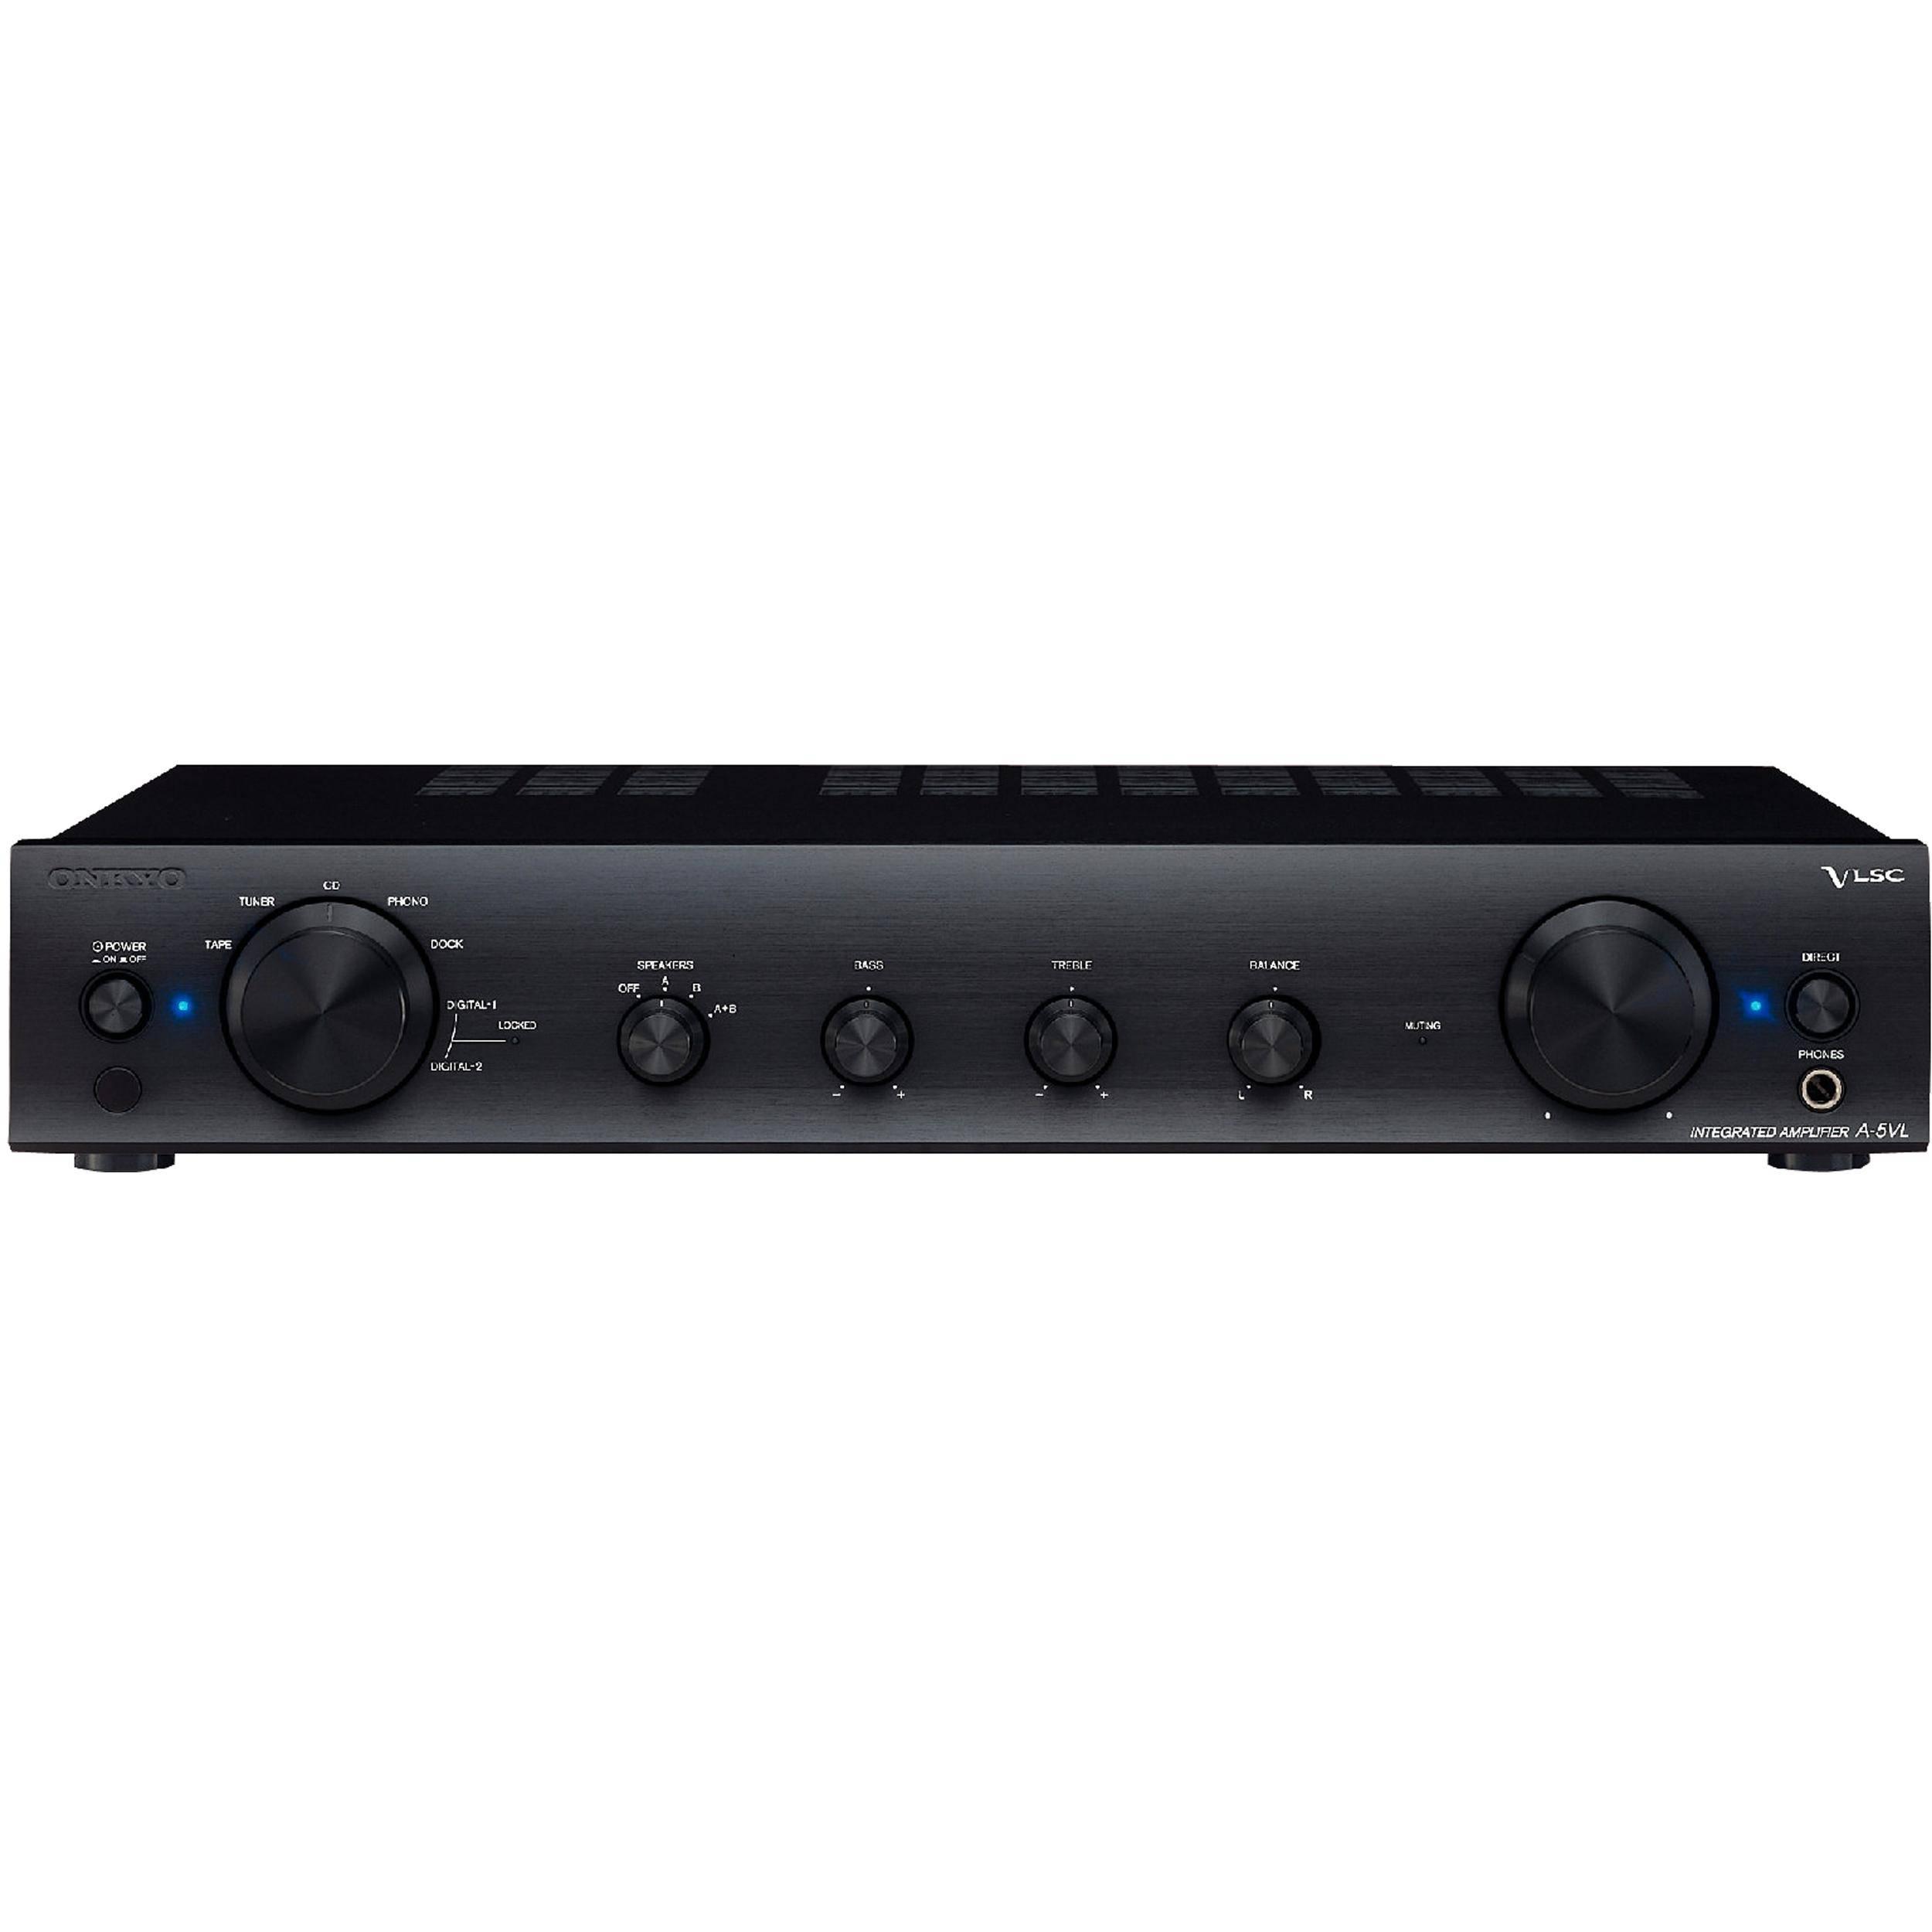 onkyo integrated amplifier. onkyo a-5vl integrated amplifier (black)